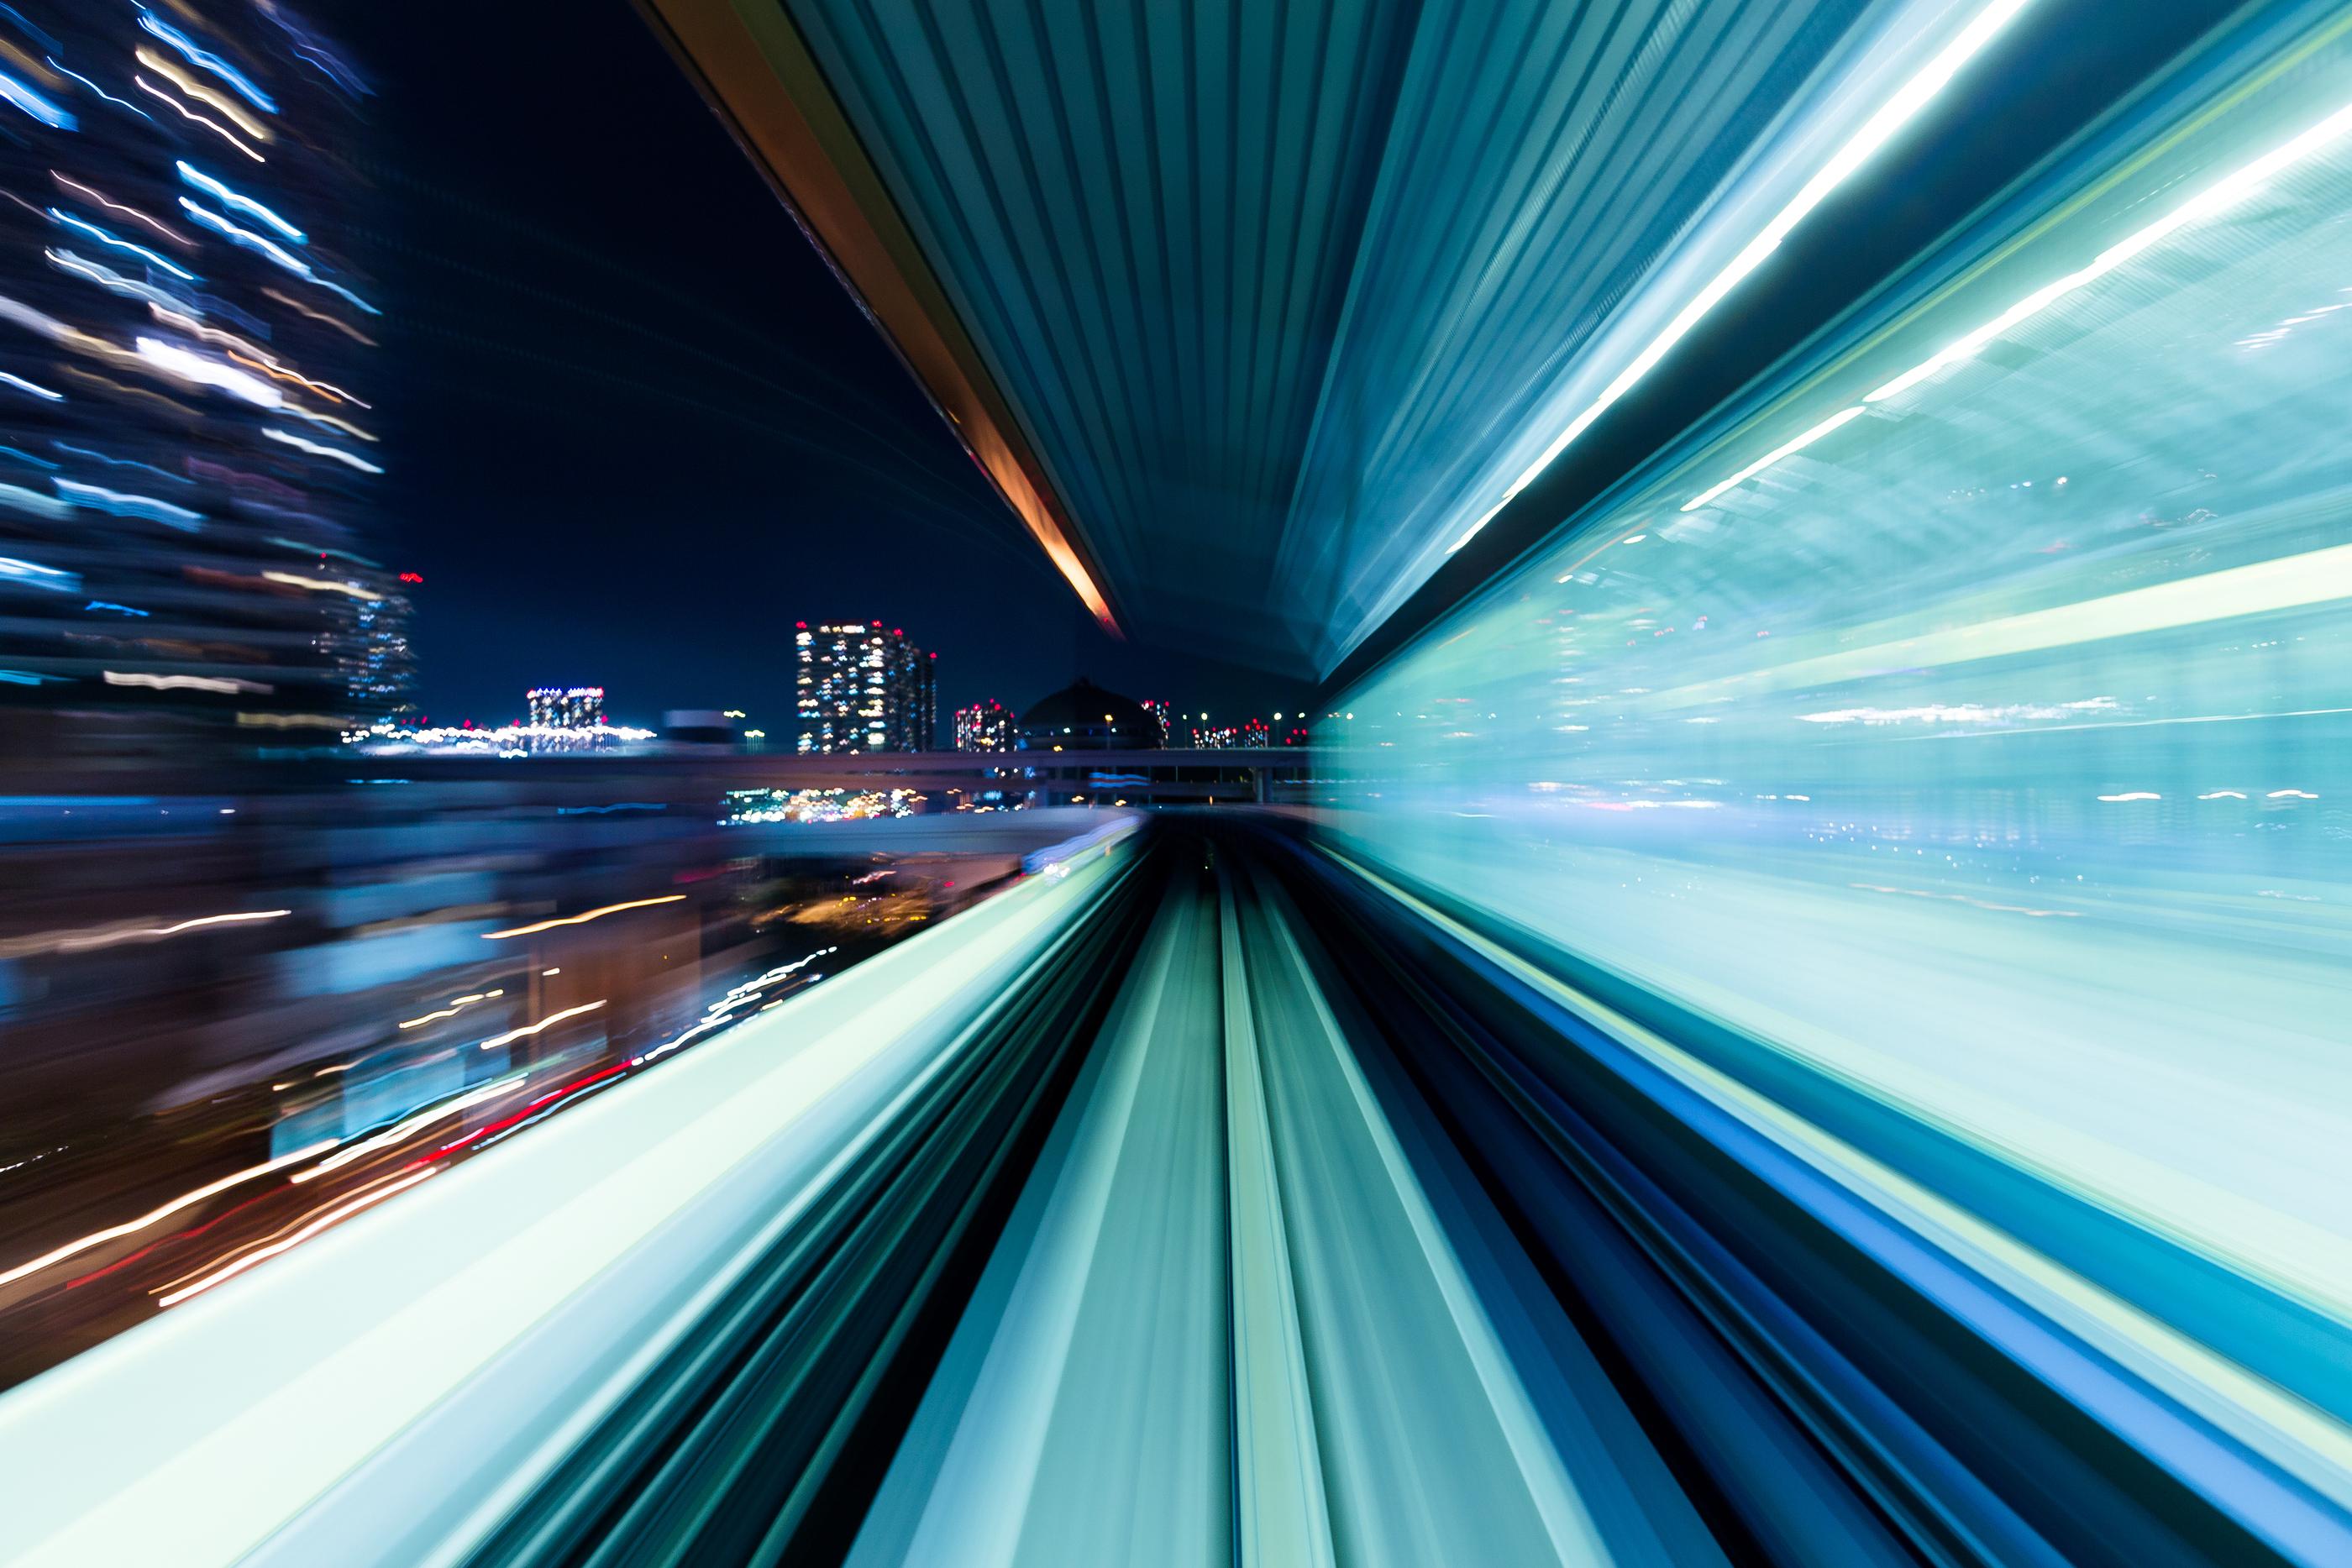 Motion blur of train moving inside tunnel.jpg